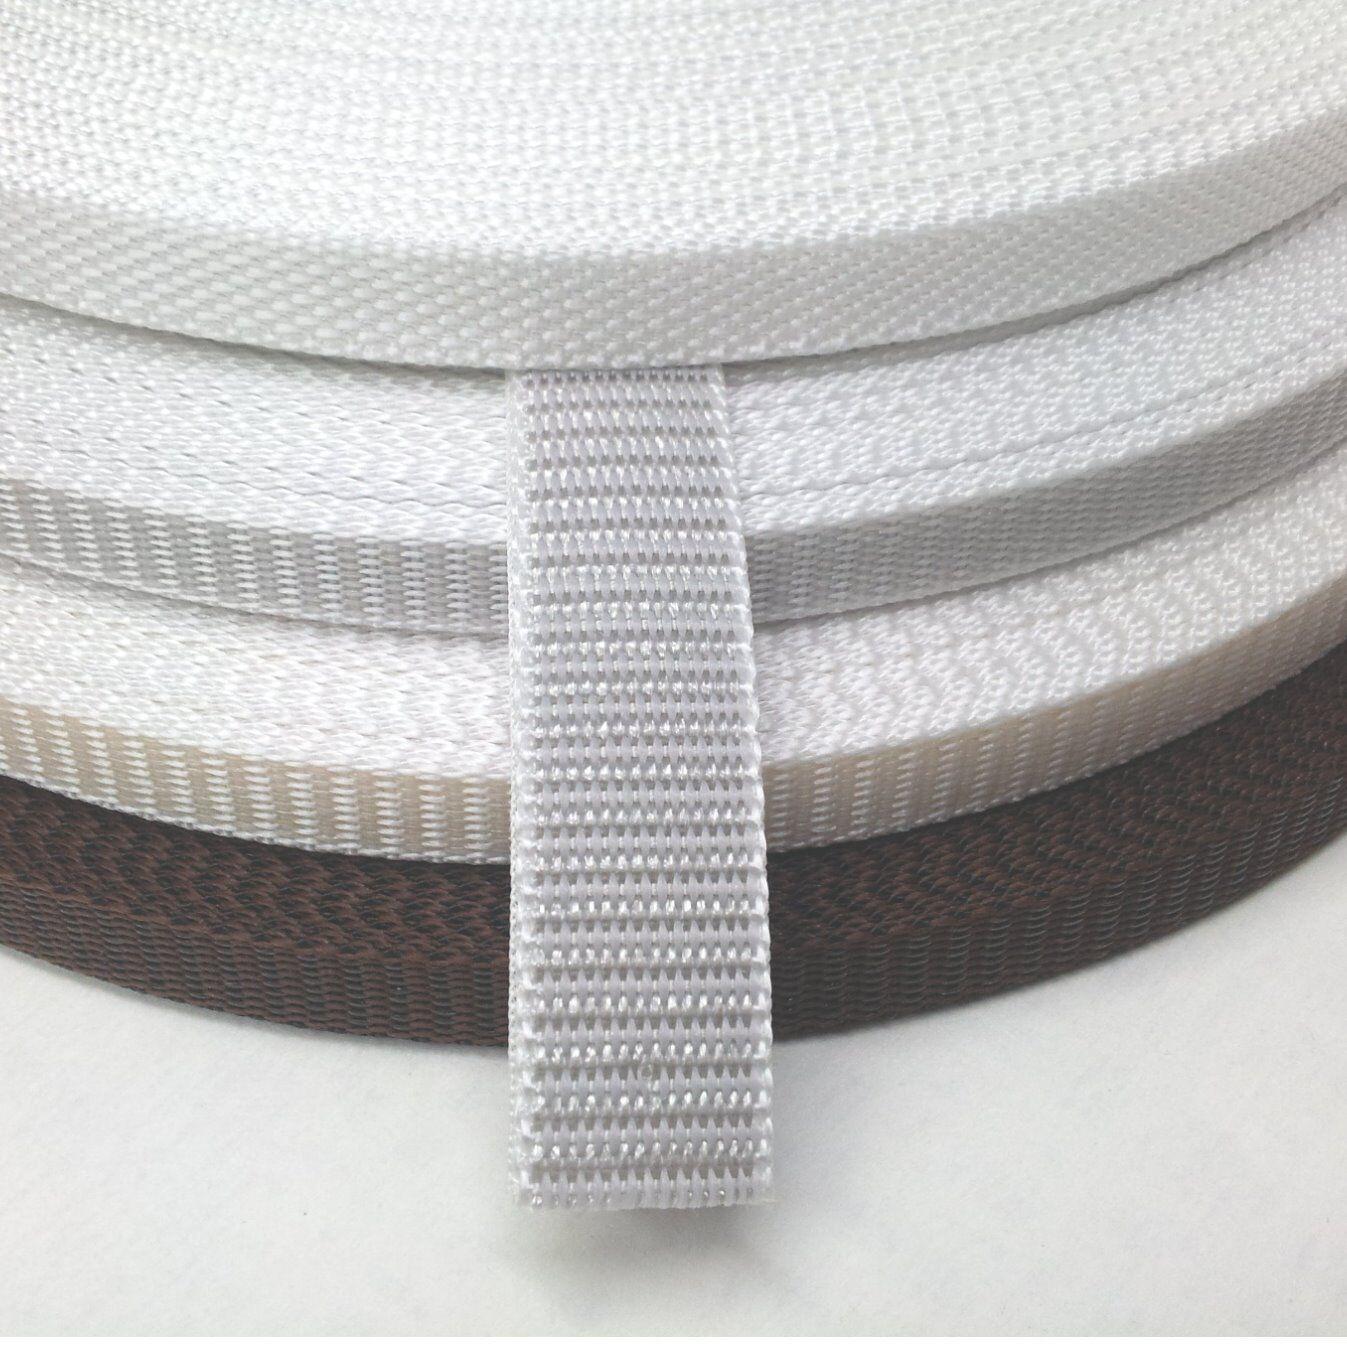 Avvolgibile Cinghia CINGHIA 10, 12, 14mm SERRANDA corda, corda, corda, misura di fabbricazione 83b0b3